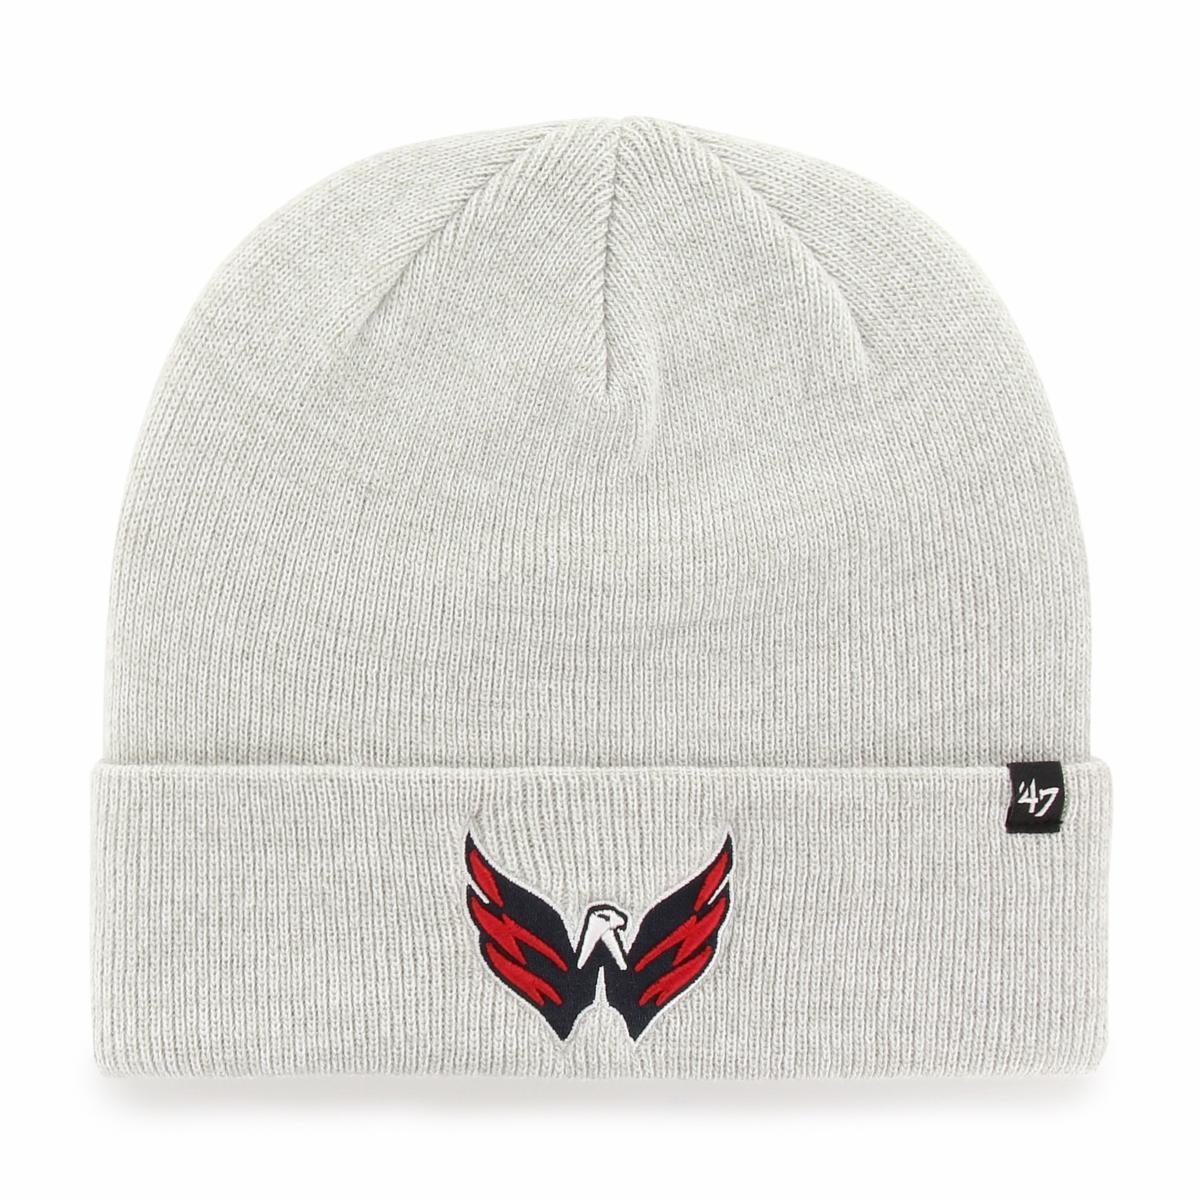 BRAND 47 Washington Capitals Checker Cuff Knit Winter Hat